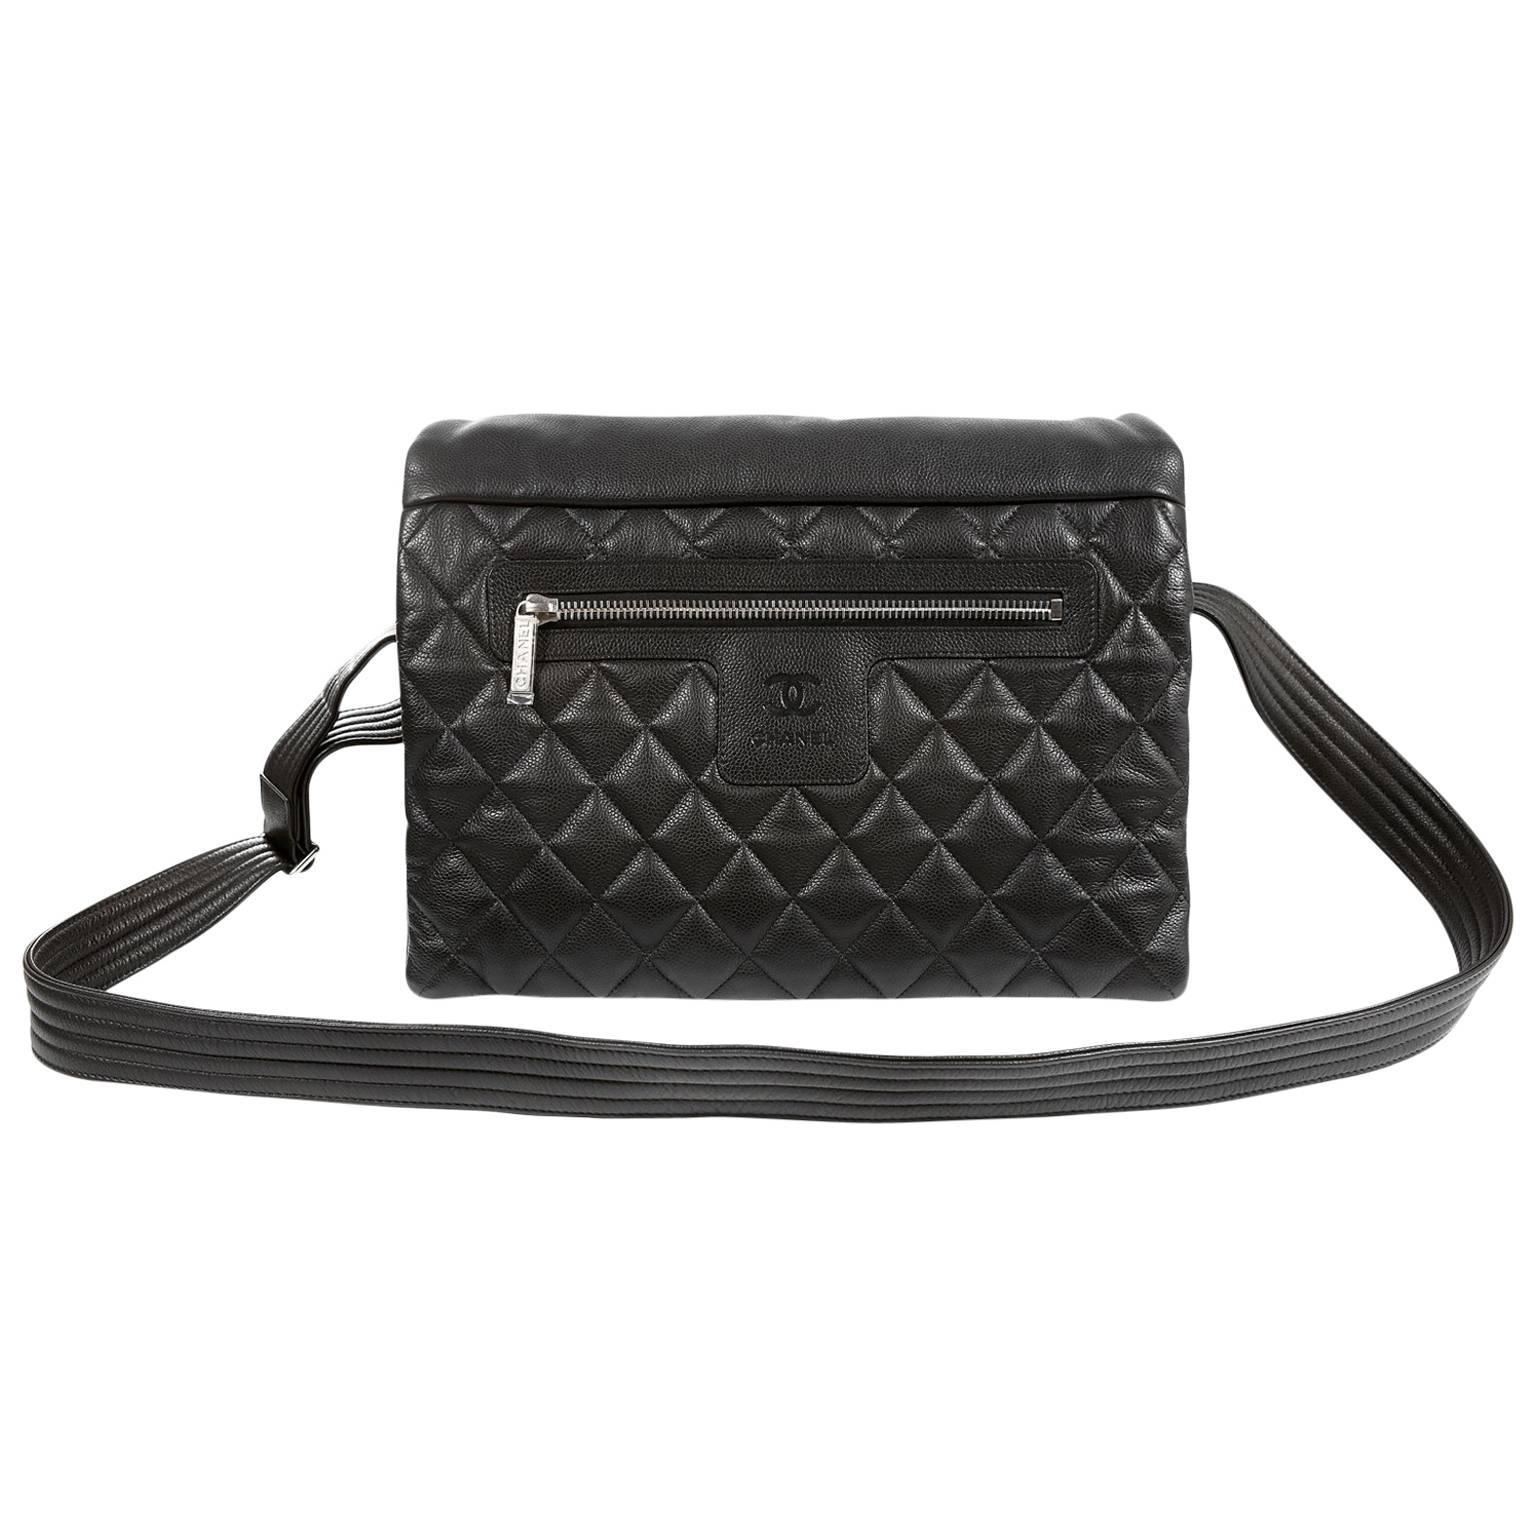 Chanel Black Caviar Large Coco Cocoon Messenger Bag